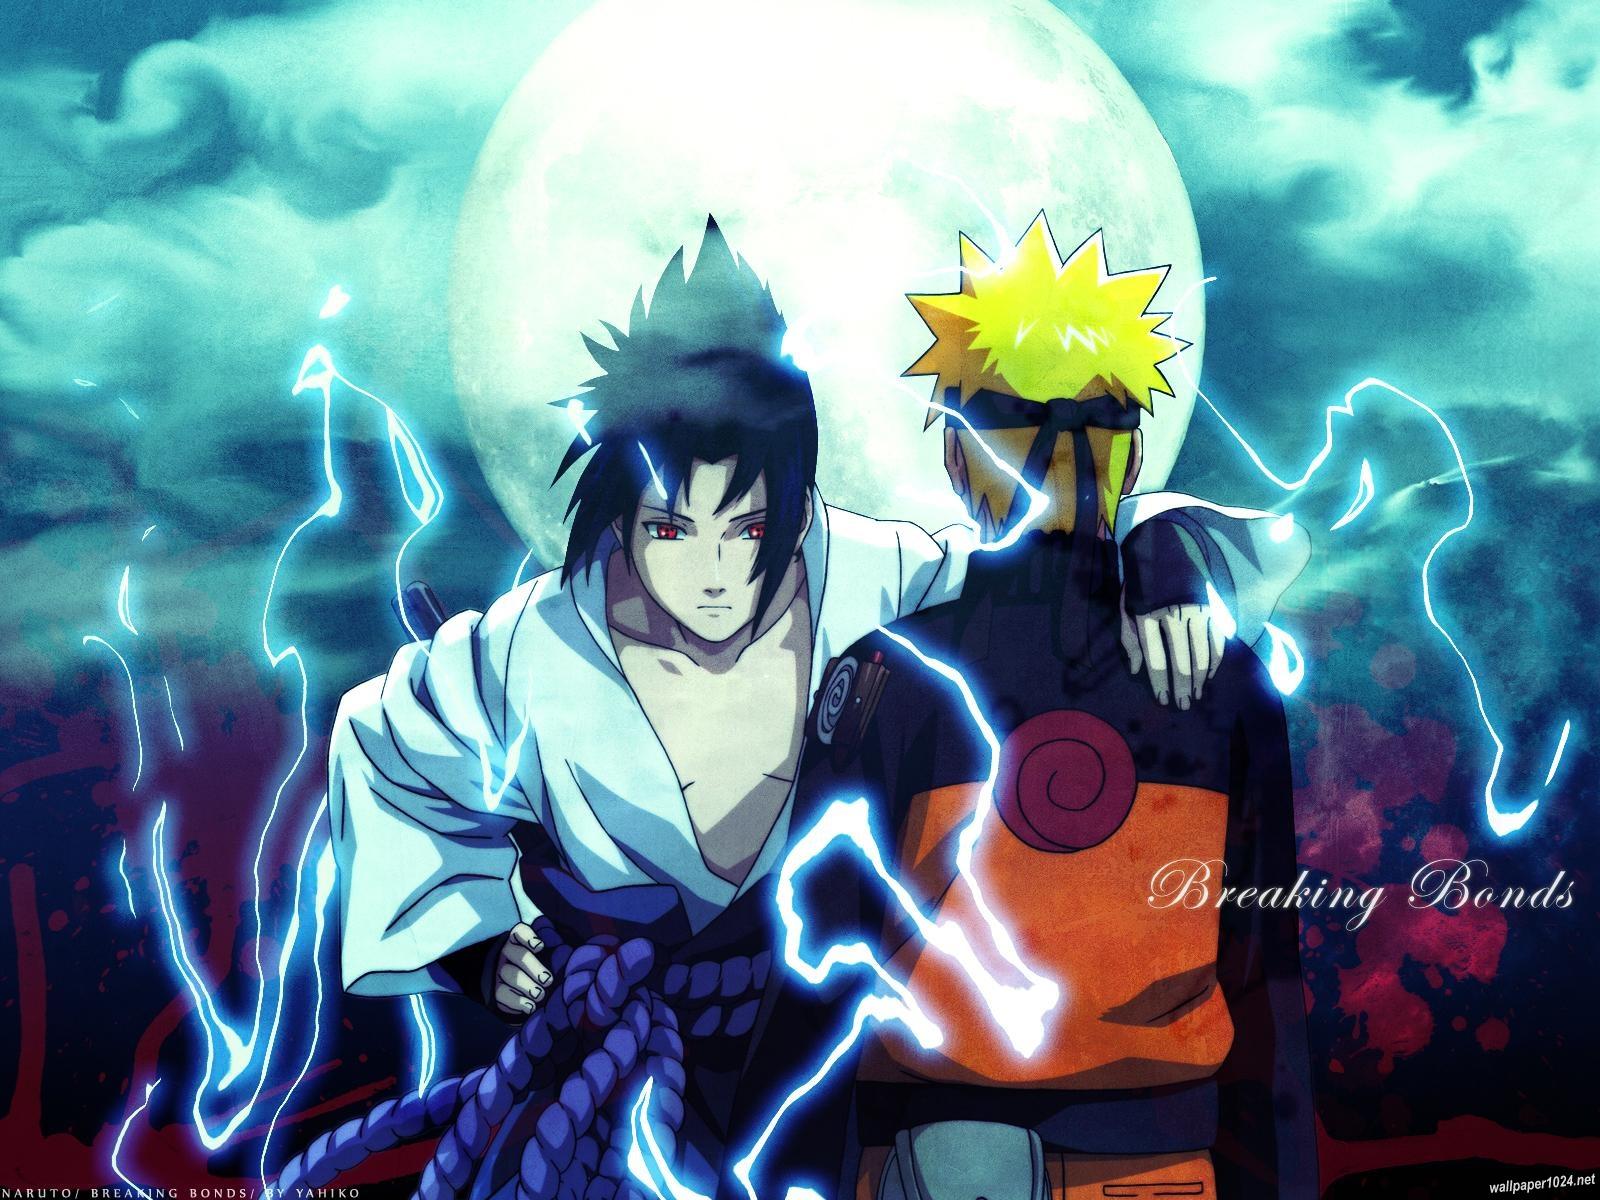 http://4.bp.blogspot.com/-ST2F81lEpOw/Ttjgdk0VDnI/AAAAAAAACwM/8wt87kom9zQ/s1600/Naruto_Shippuden_Wallpapers.jpg